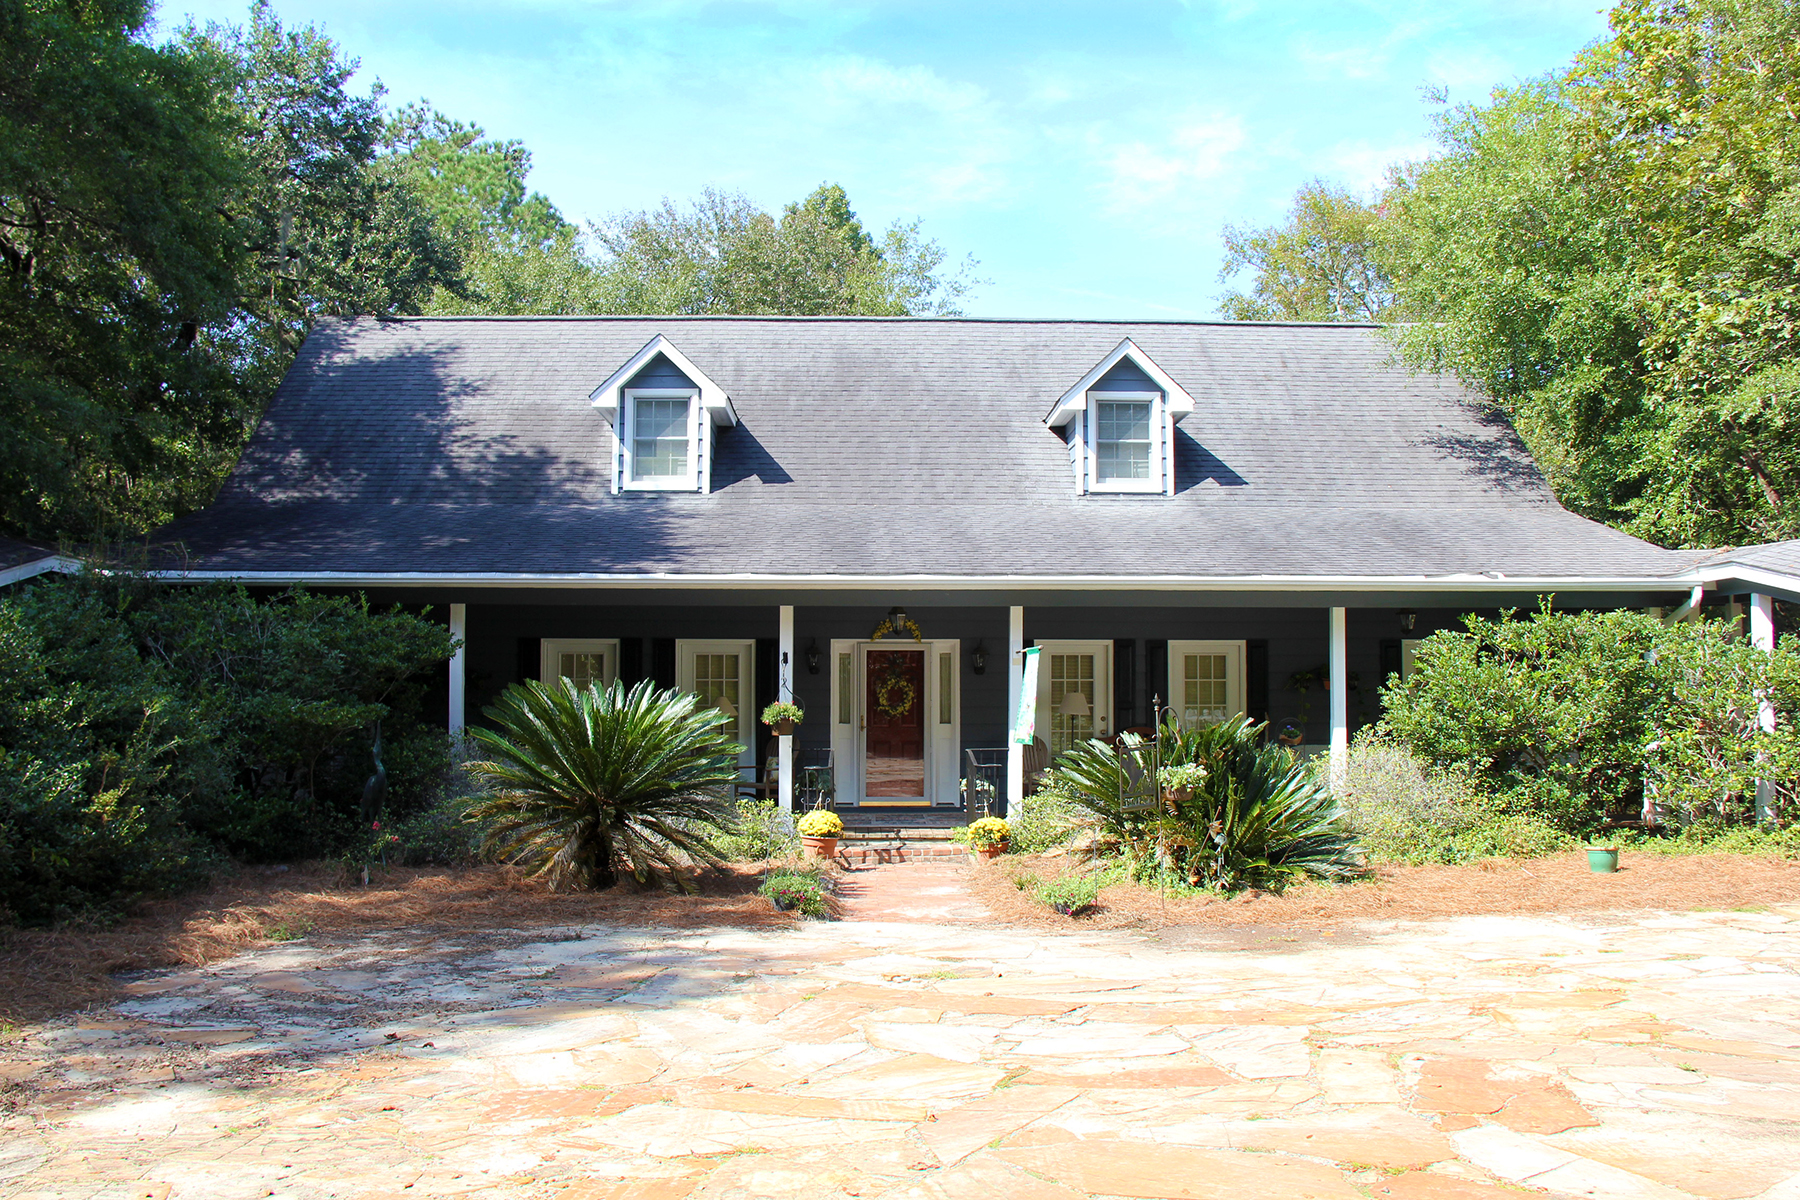 Single Family Home for Sale at 4996 Maybank Hwy Wadmalaw Island, South Carolina, 29487 United States